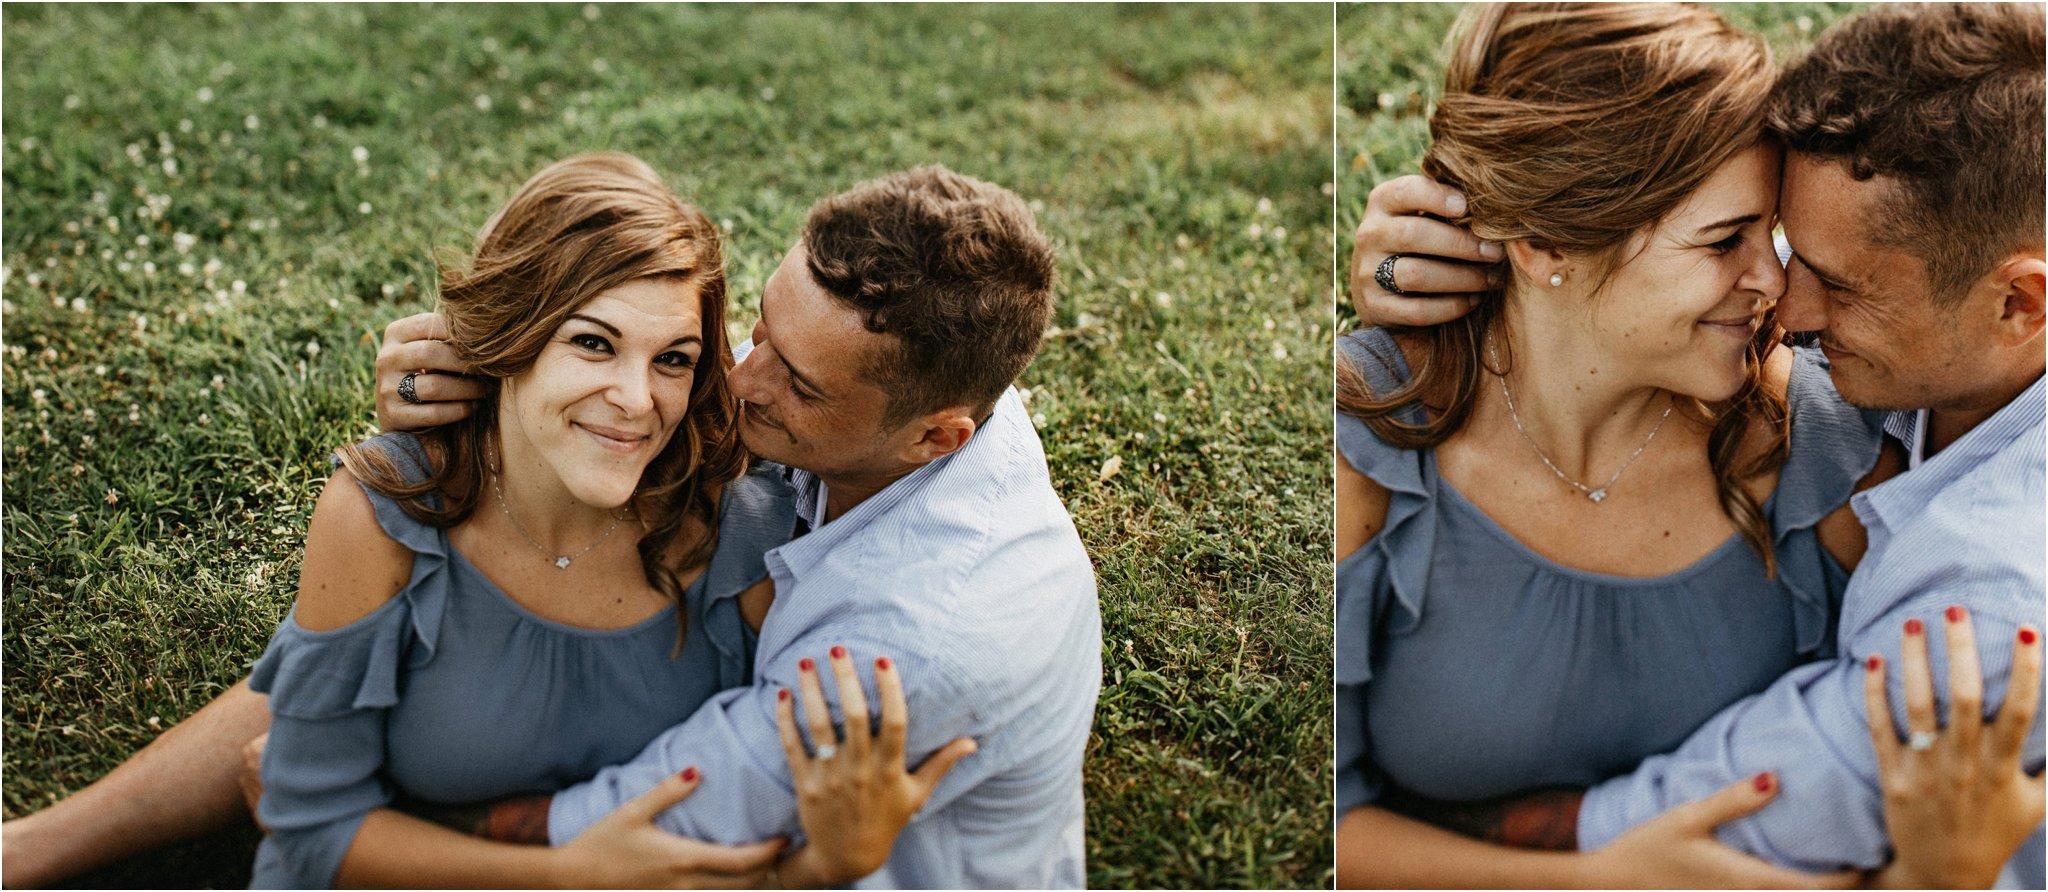 Claytor Lake State Park - Engagement portraits - Virginia wedding photographer - Pat Cori Photography-28.jpg